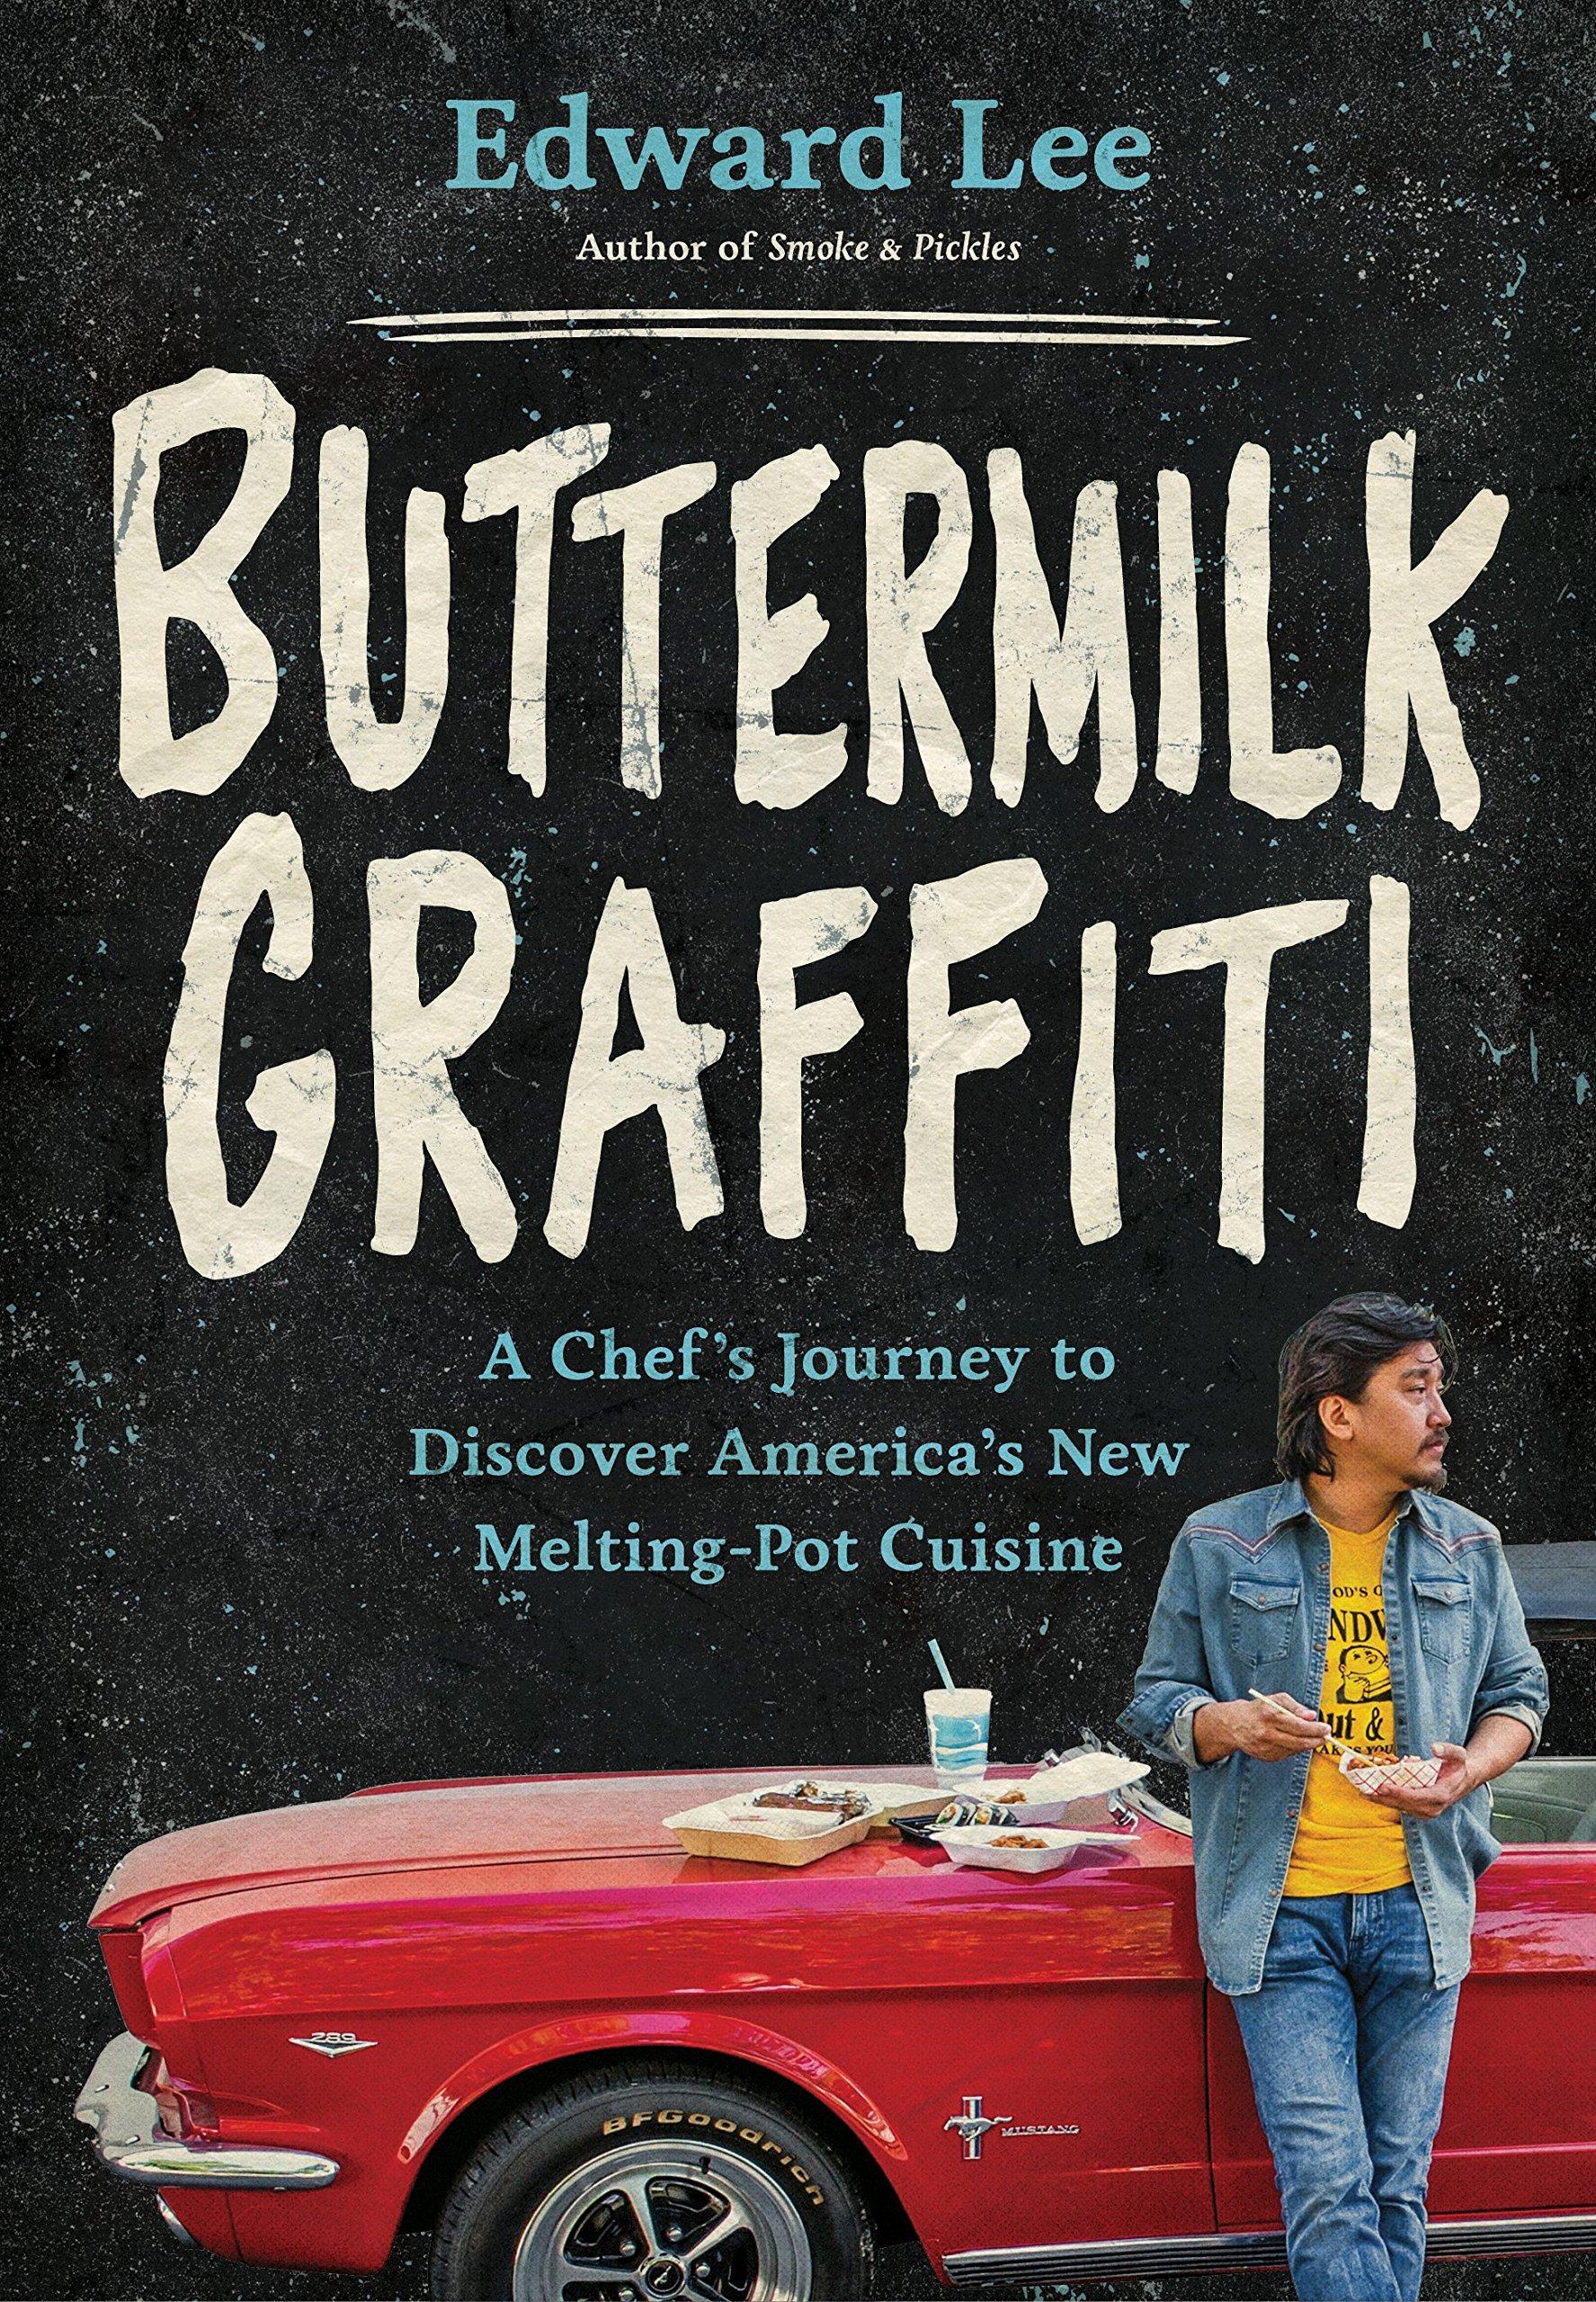 Read Online Buttermilk Graffiti: A Chef's Journey to Discover America's New Melting-Pot Cuisine pdf epub